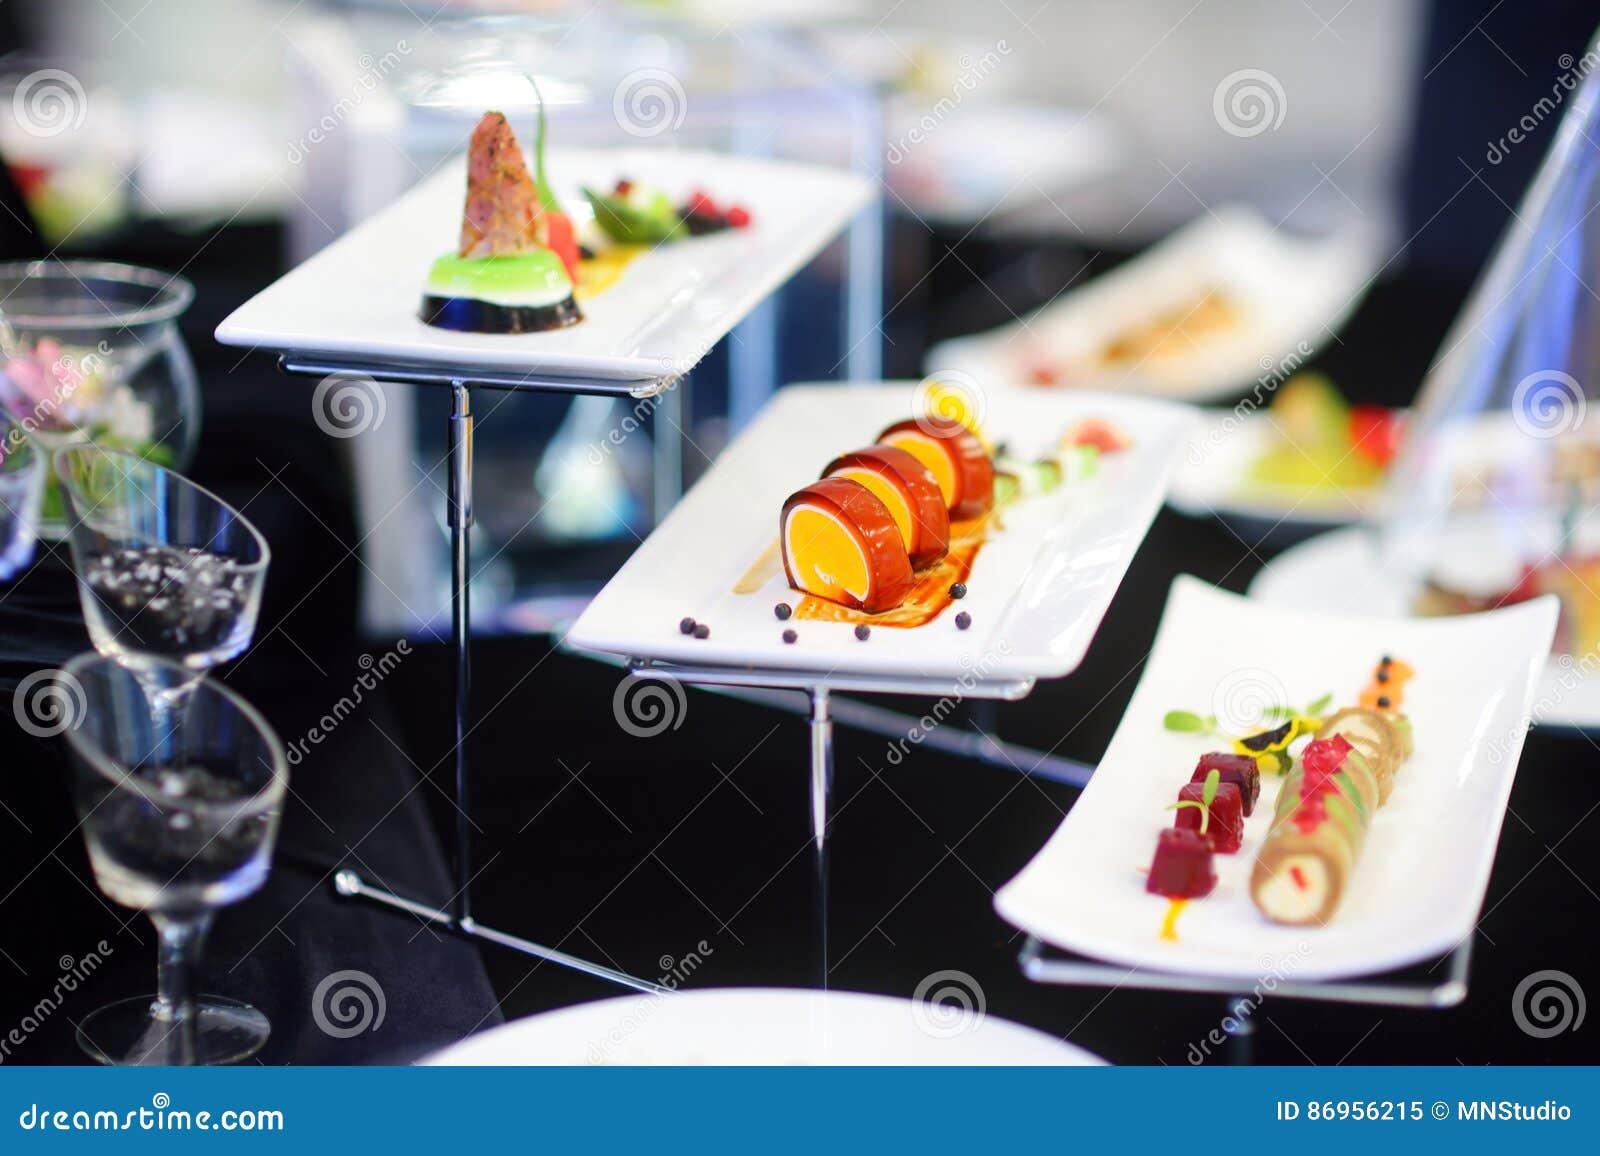 molecular modern cuisine various fancy dishes on white plates in  - molecular modern cuisine various fancy dishes on white plates in arestaurant stock photo